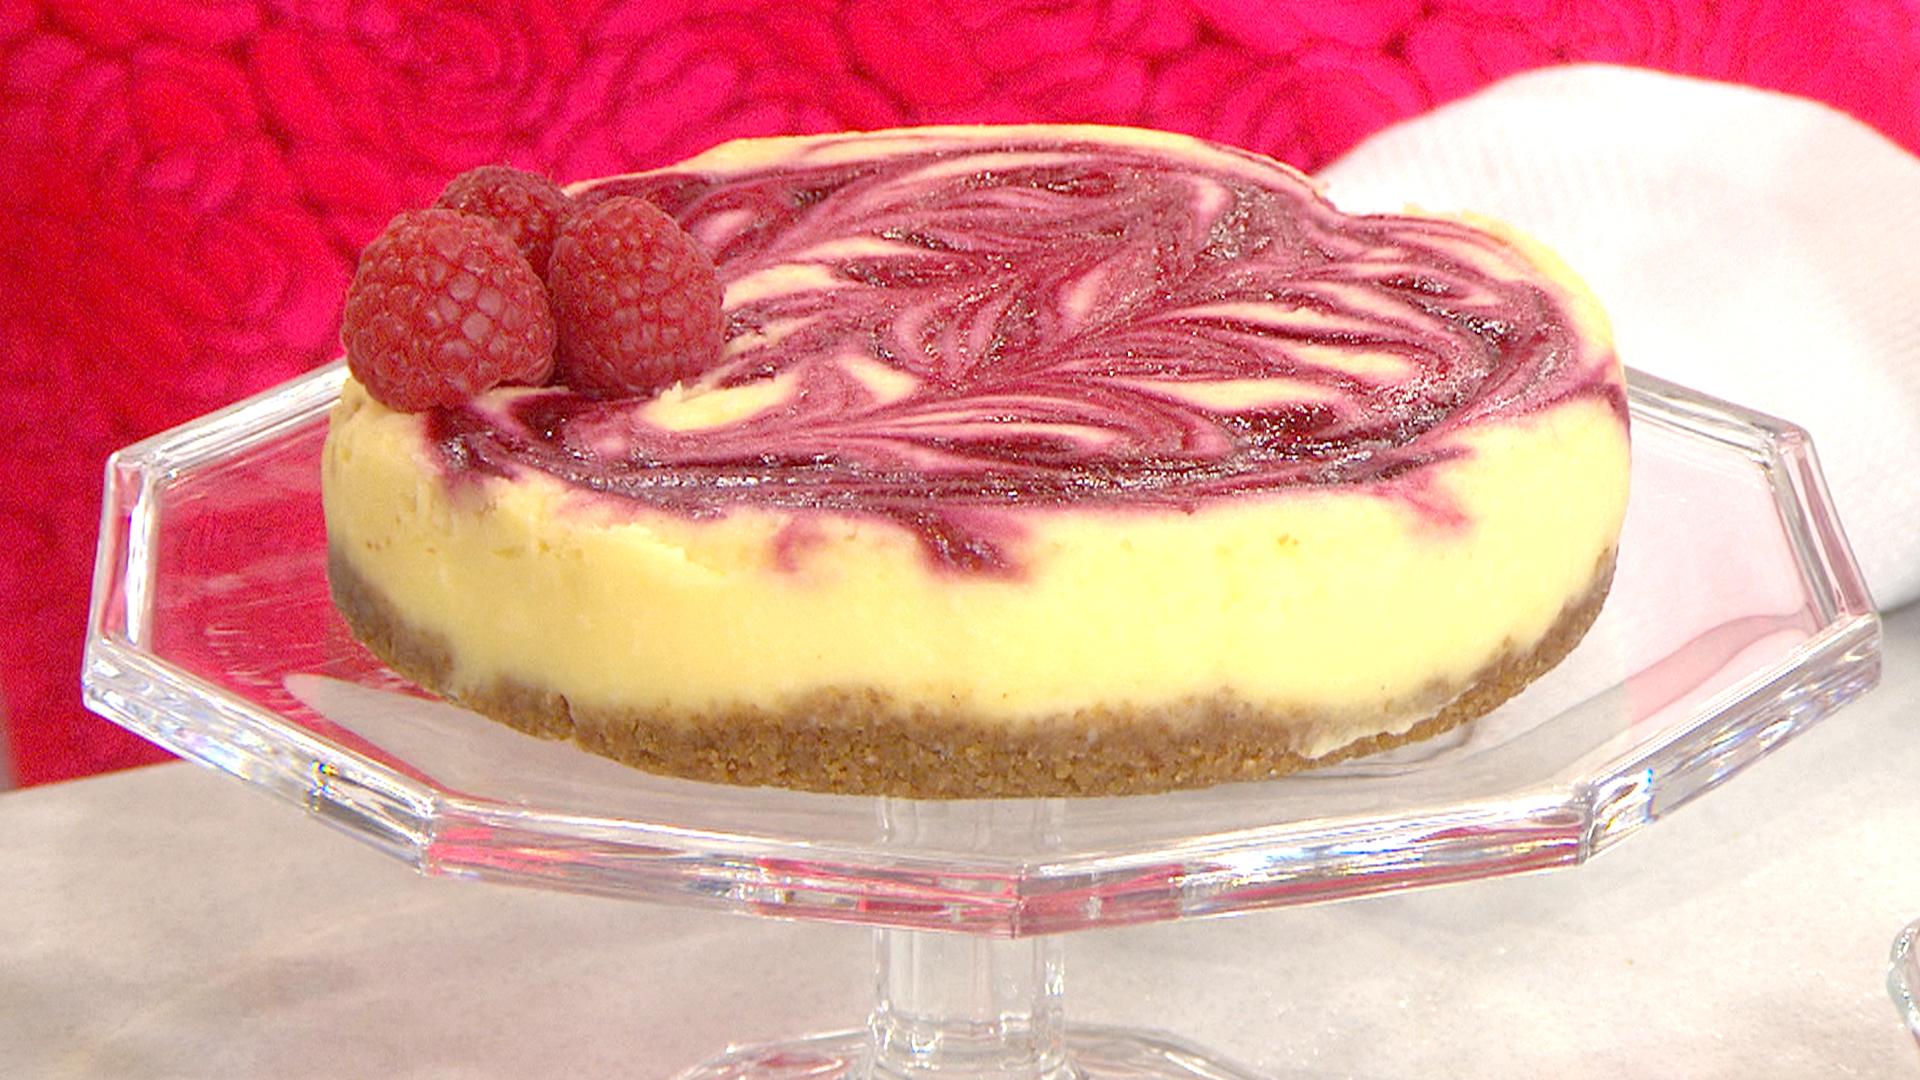 Can You Use Cheesecake Pan To Make Cake